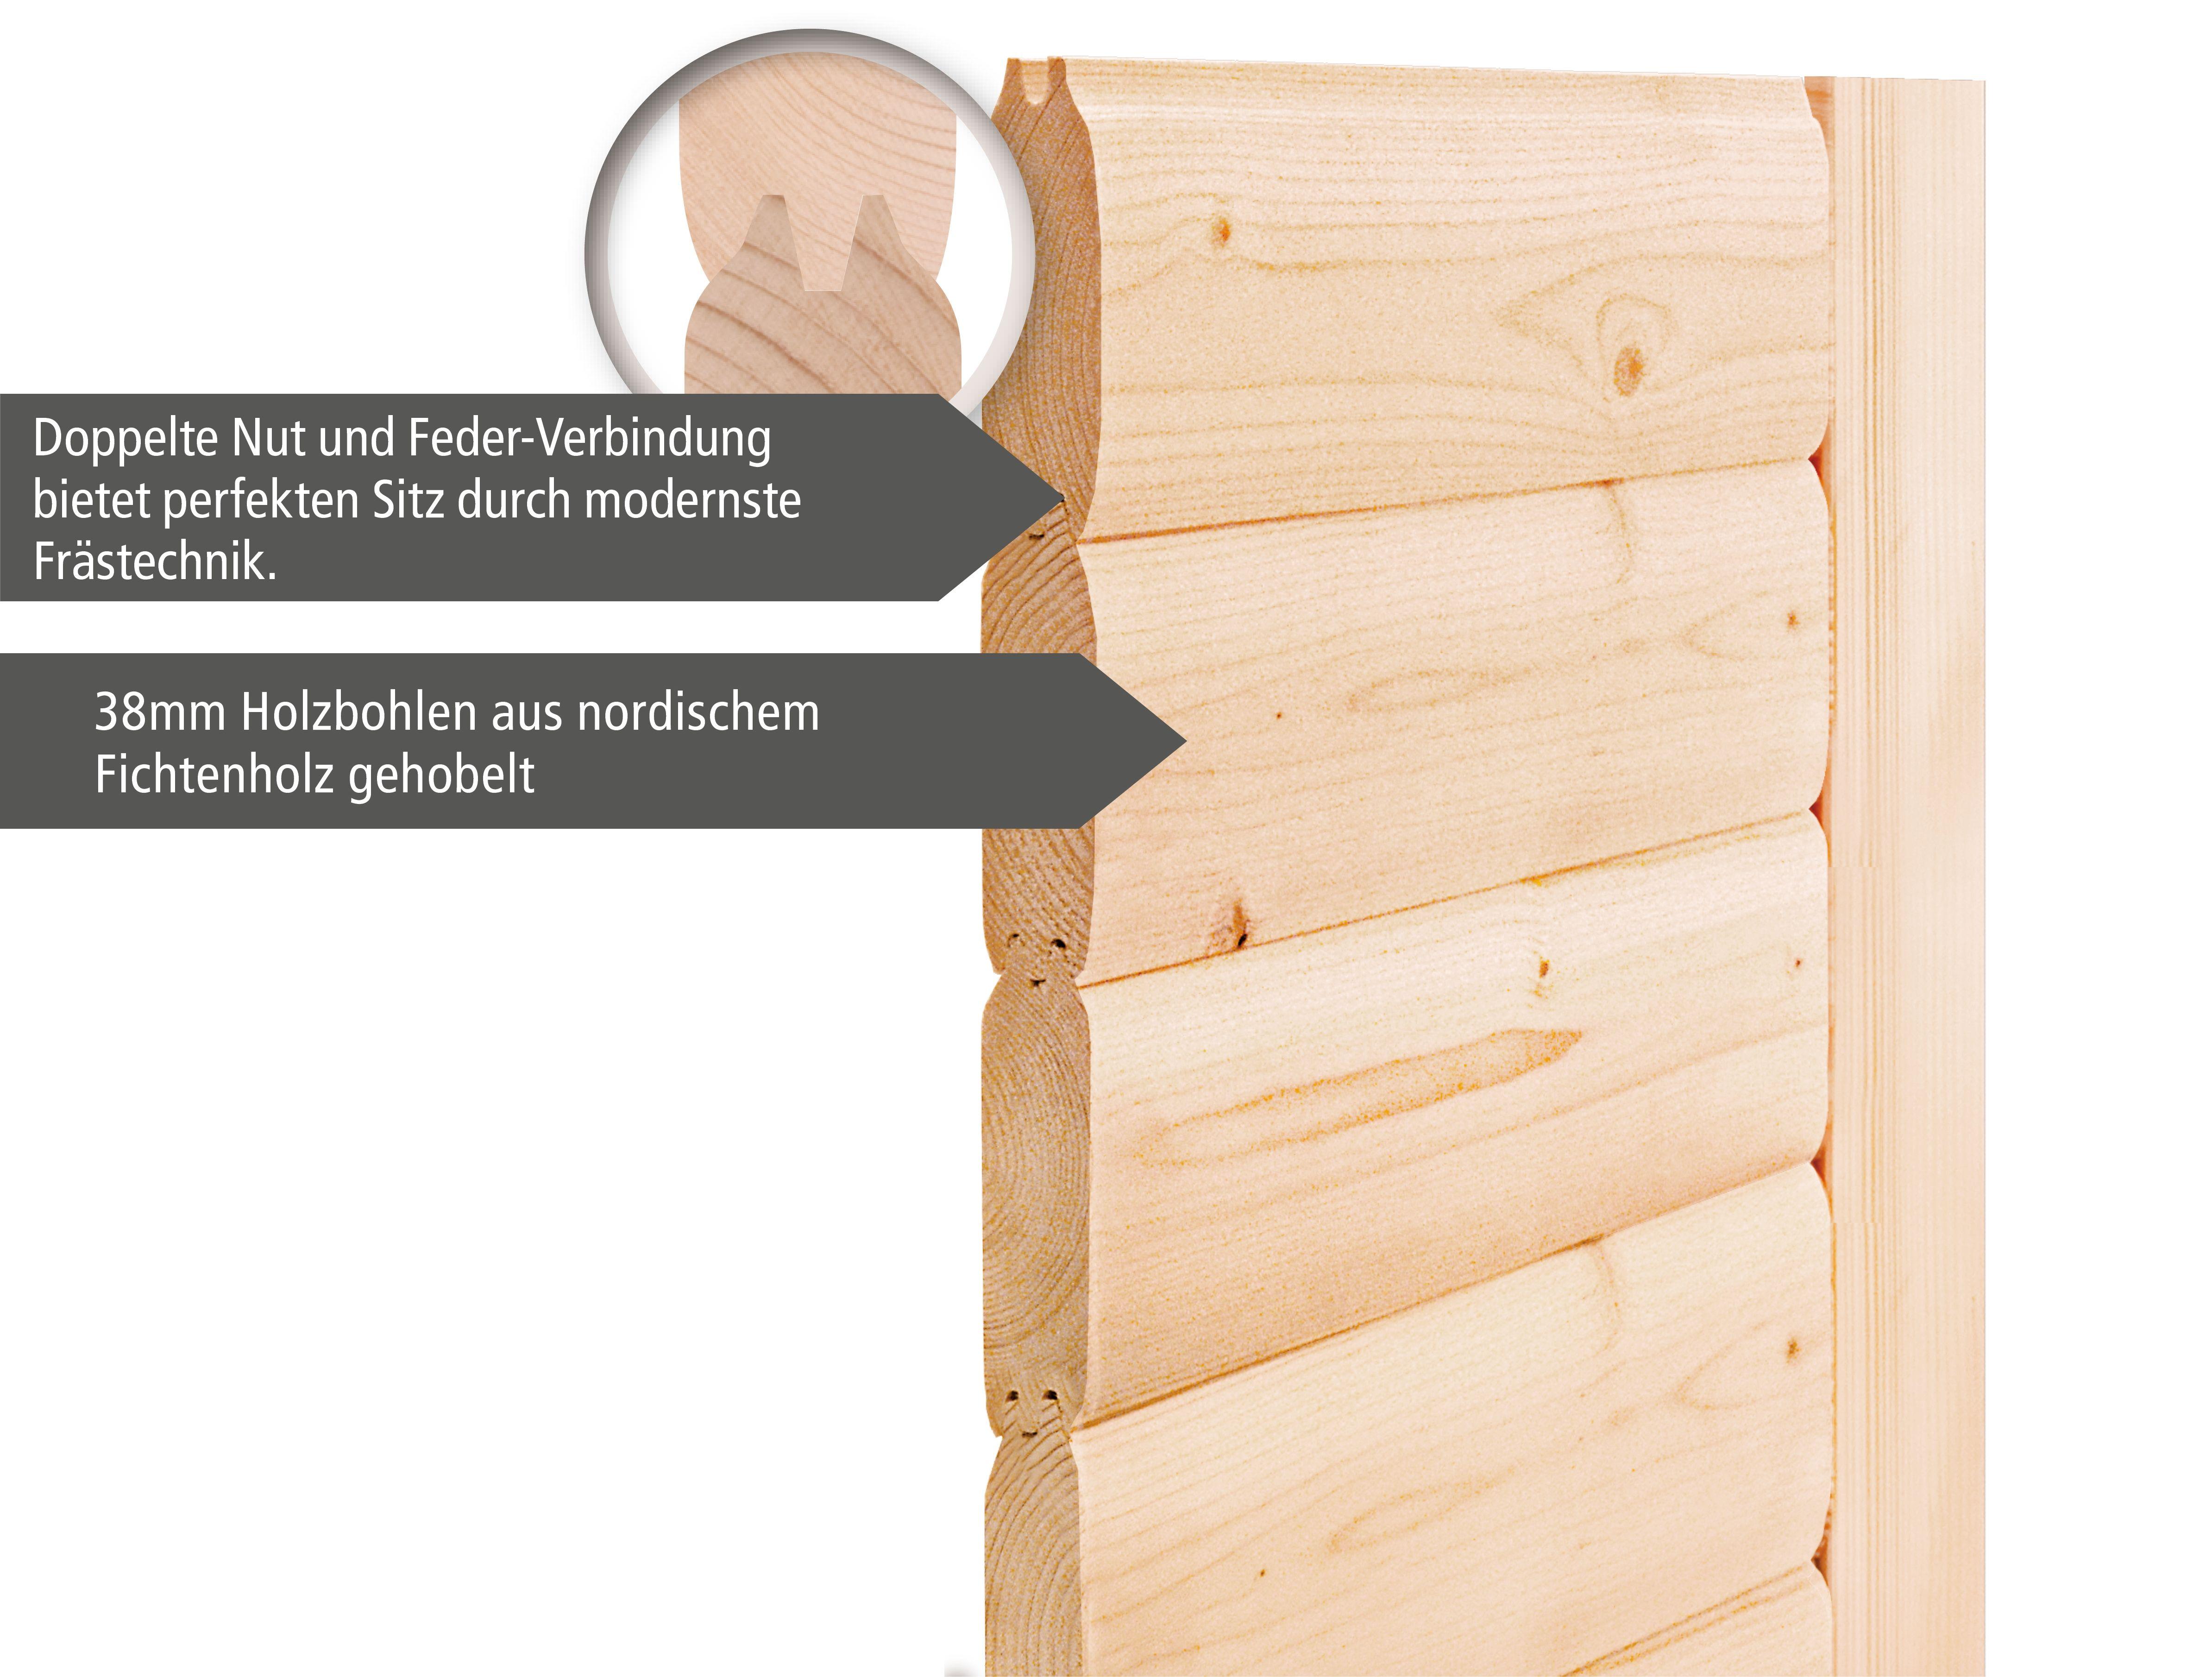 Woodfeeling Sauna Jada 38mm ohne Saunaofen Bild 2